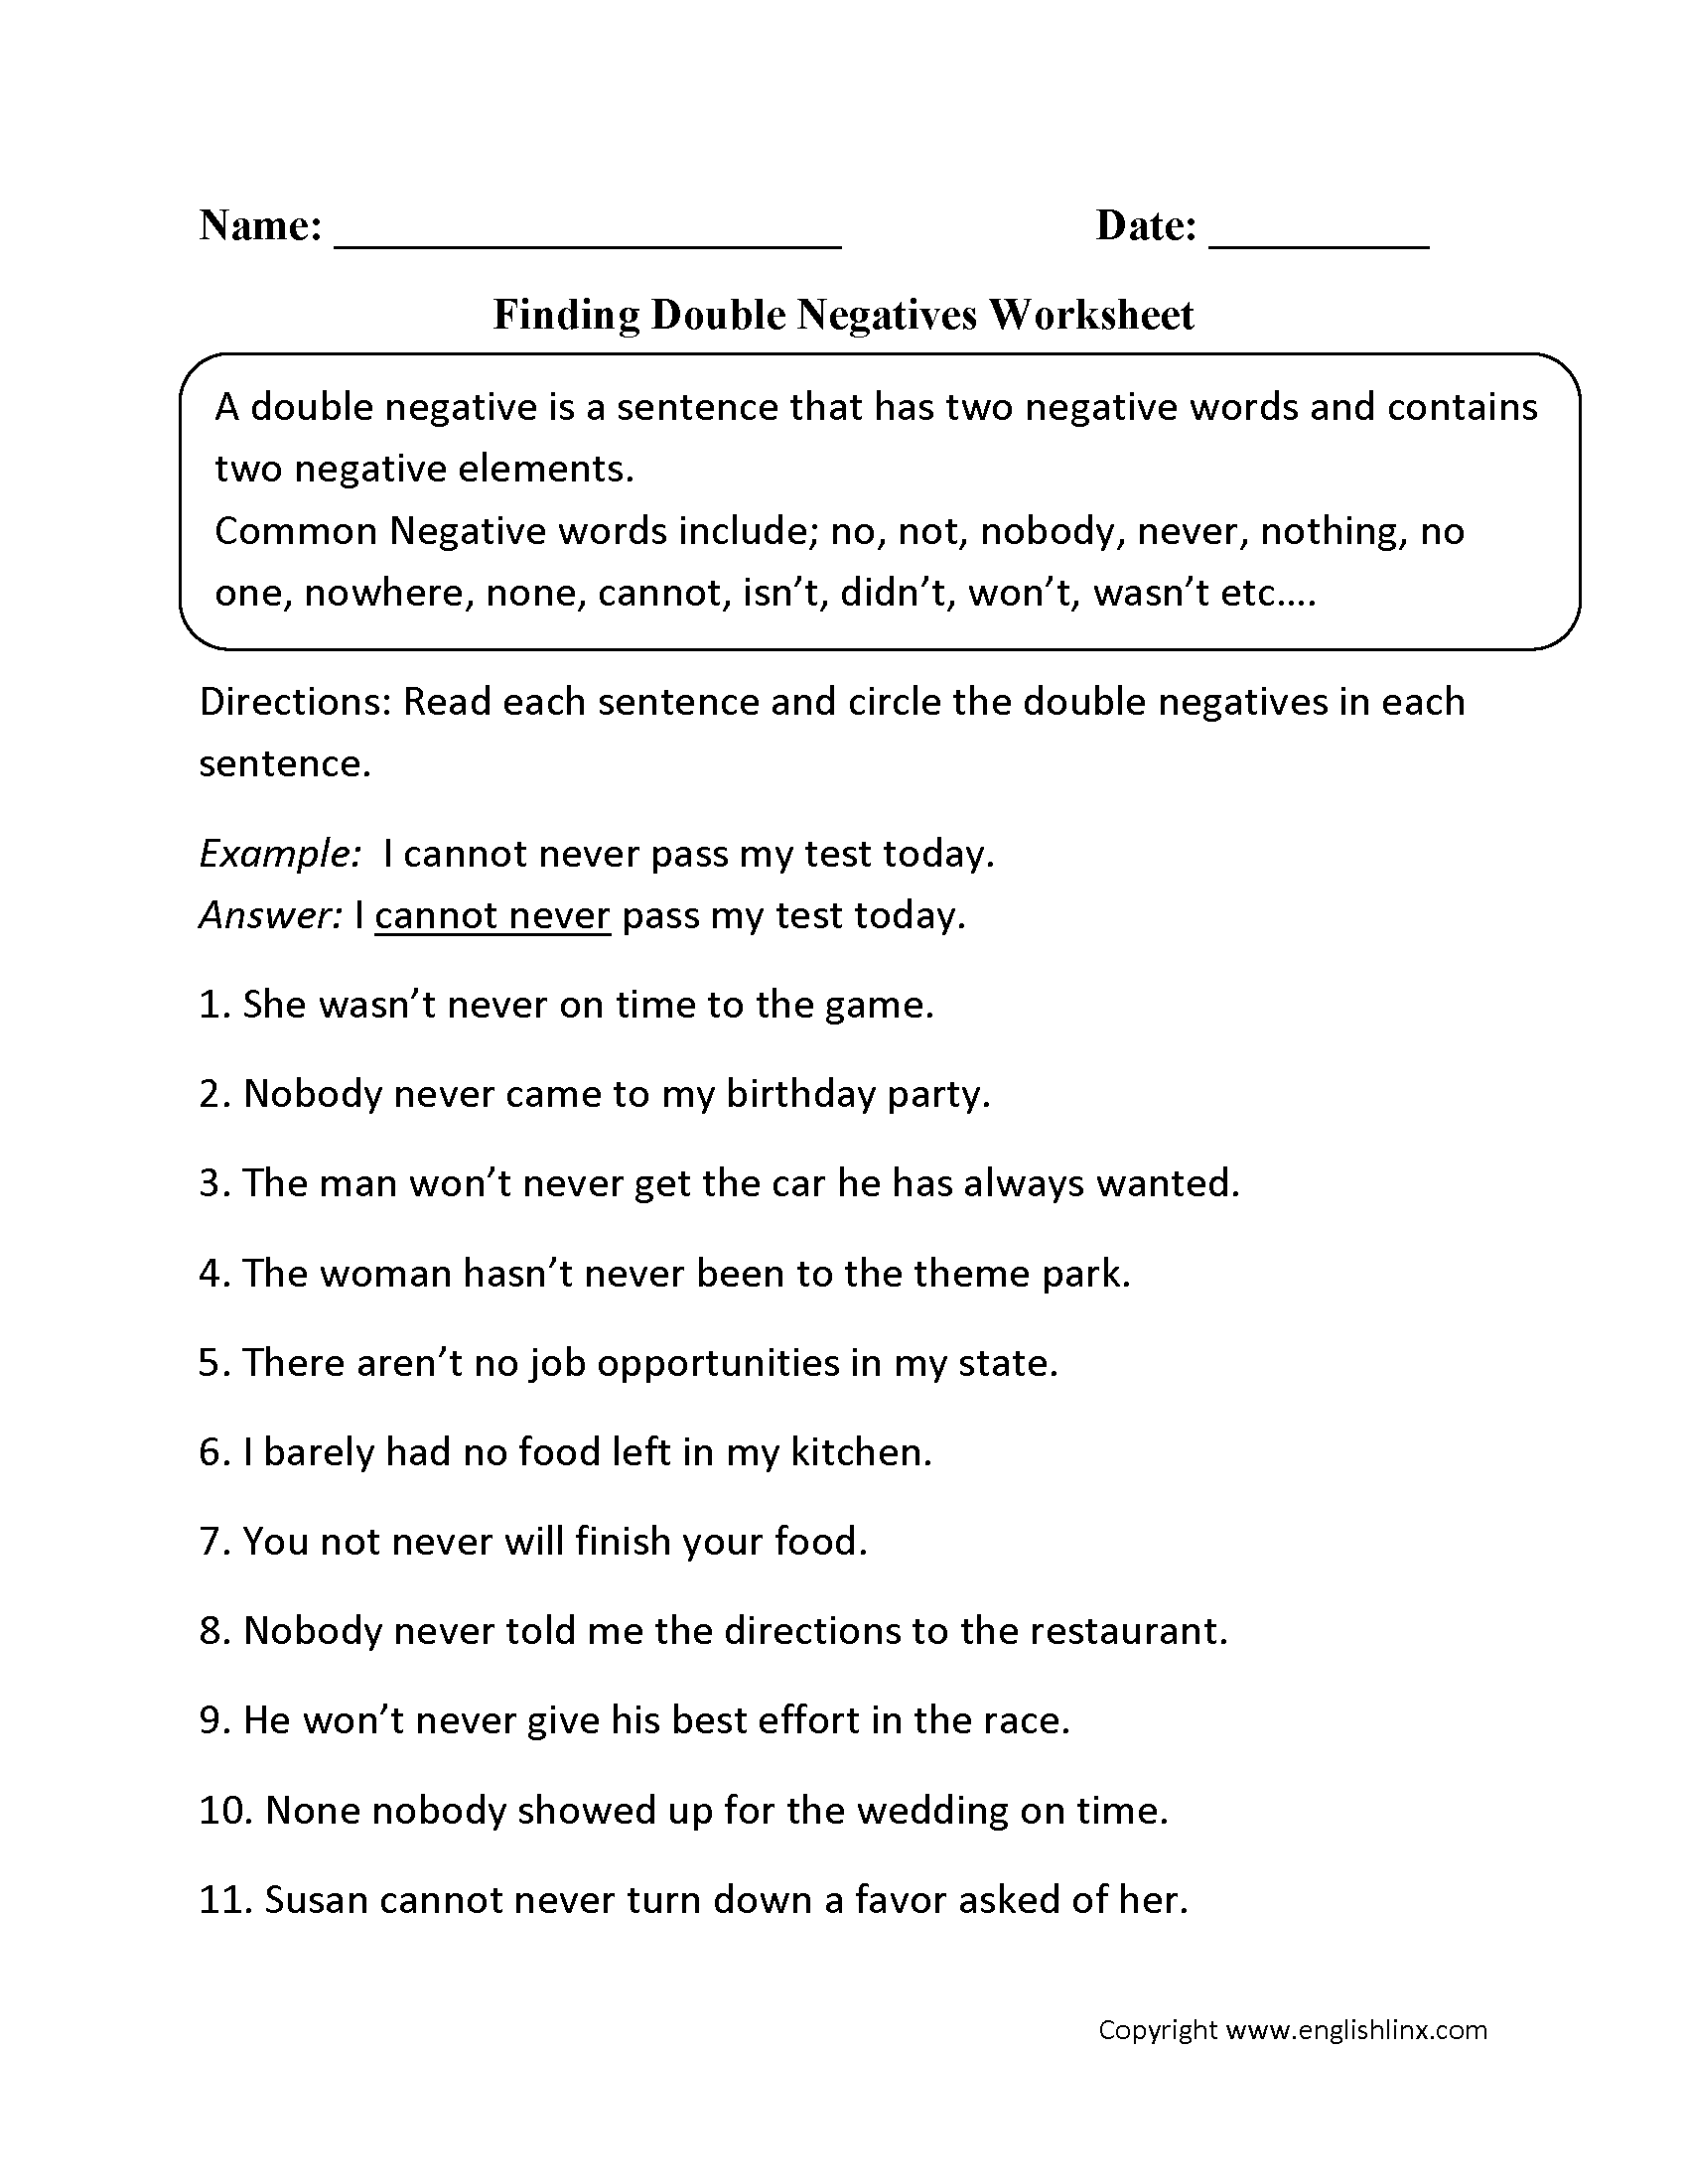 Finding Double Negatives Worksheet